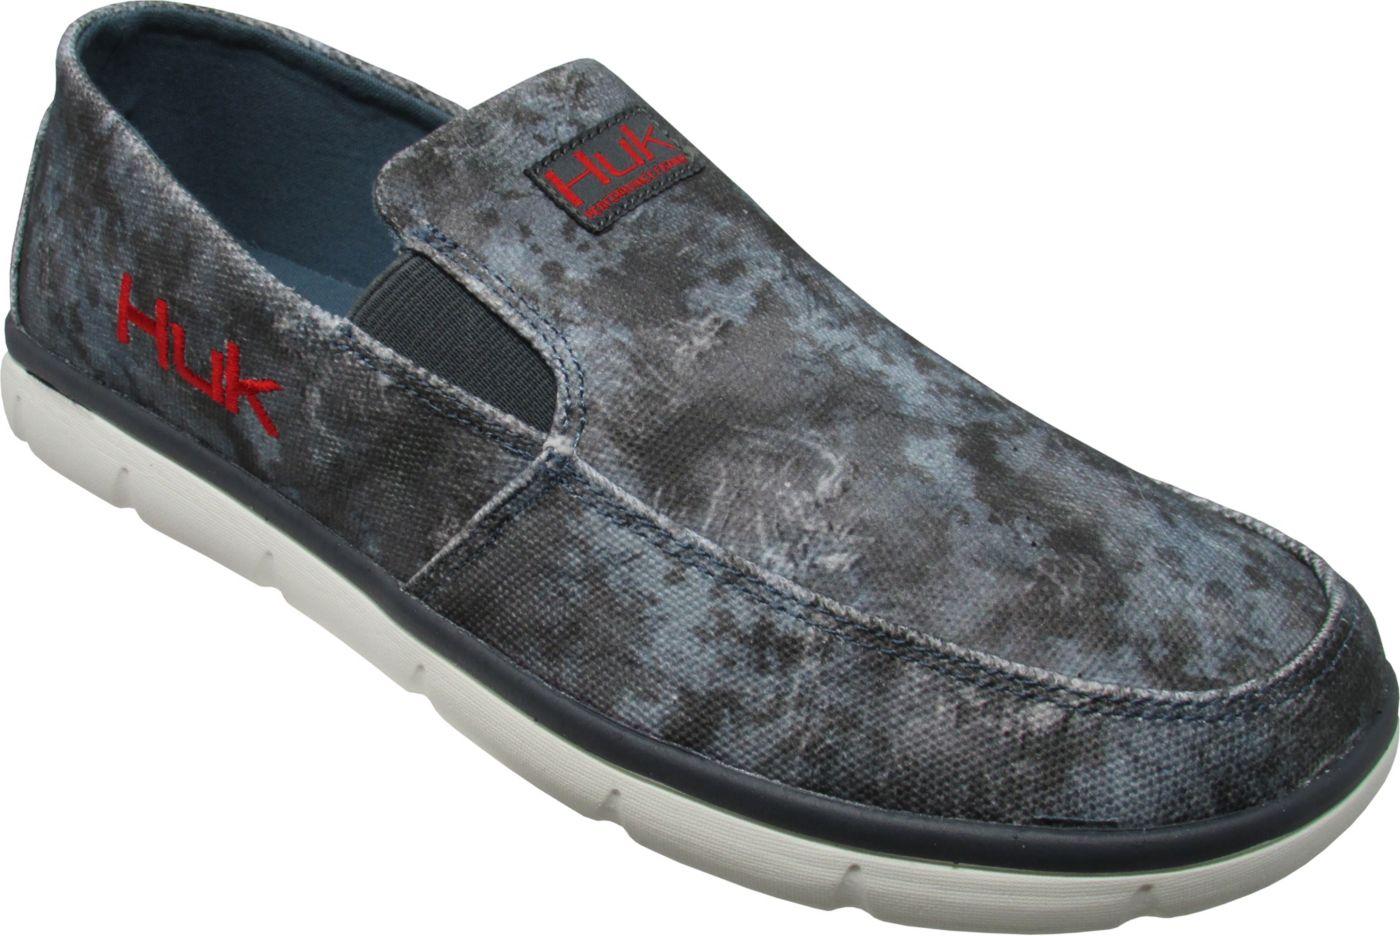 Huk Men's Subphantis Brewster Casual Shoes